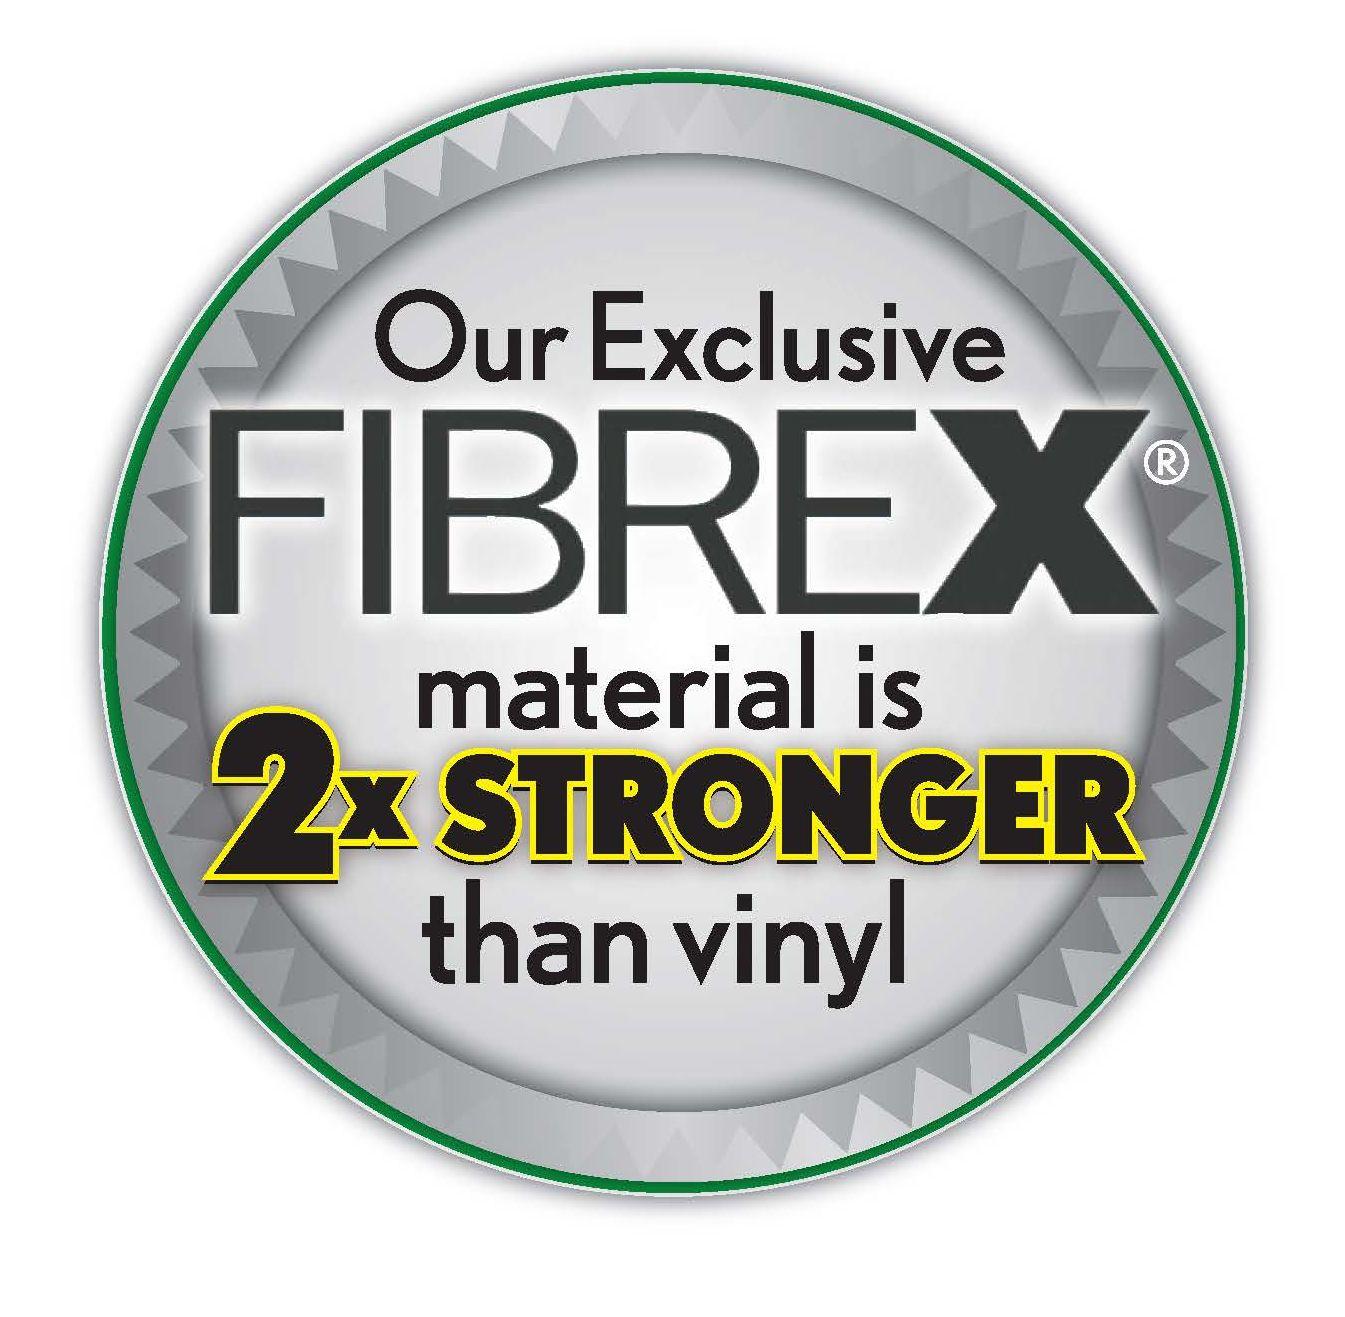 Fibrex 174 Windows By Renewal By Andersen 174 The Secret To